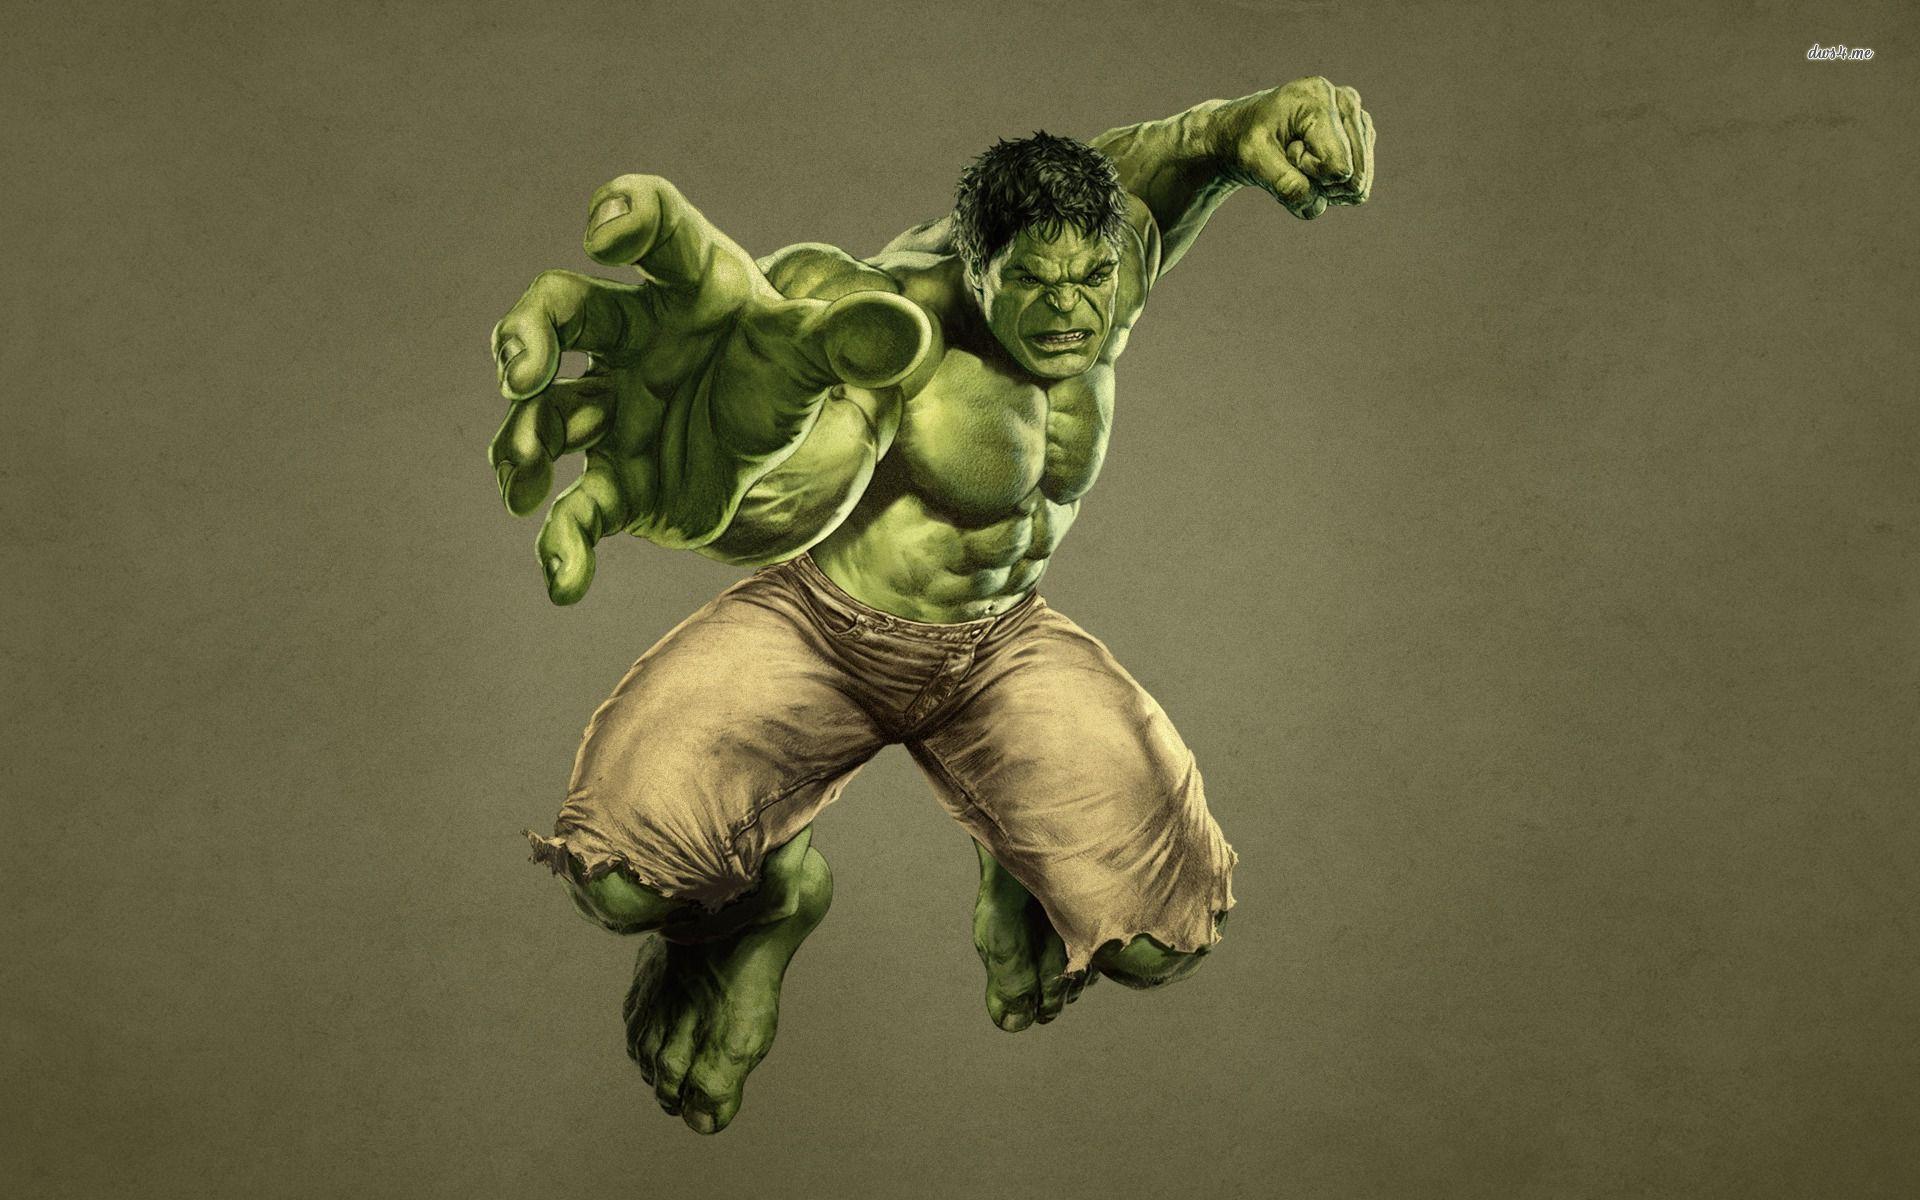 Hd wallpaper hulk - Pictures Of Hulk